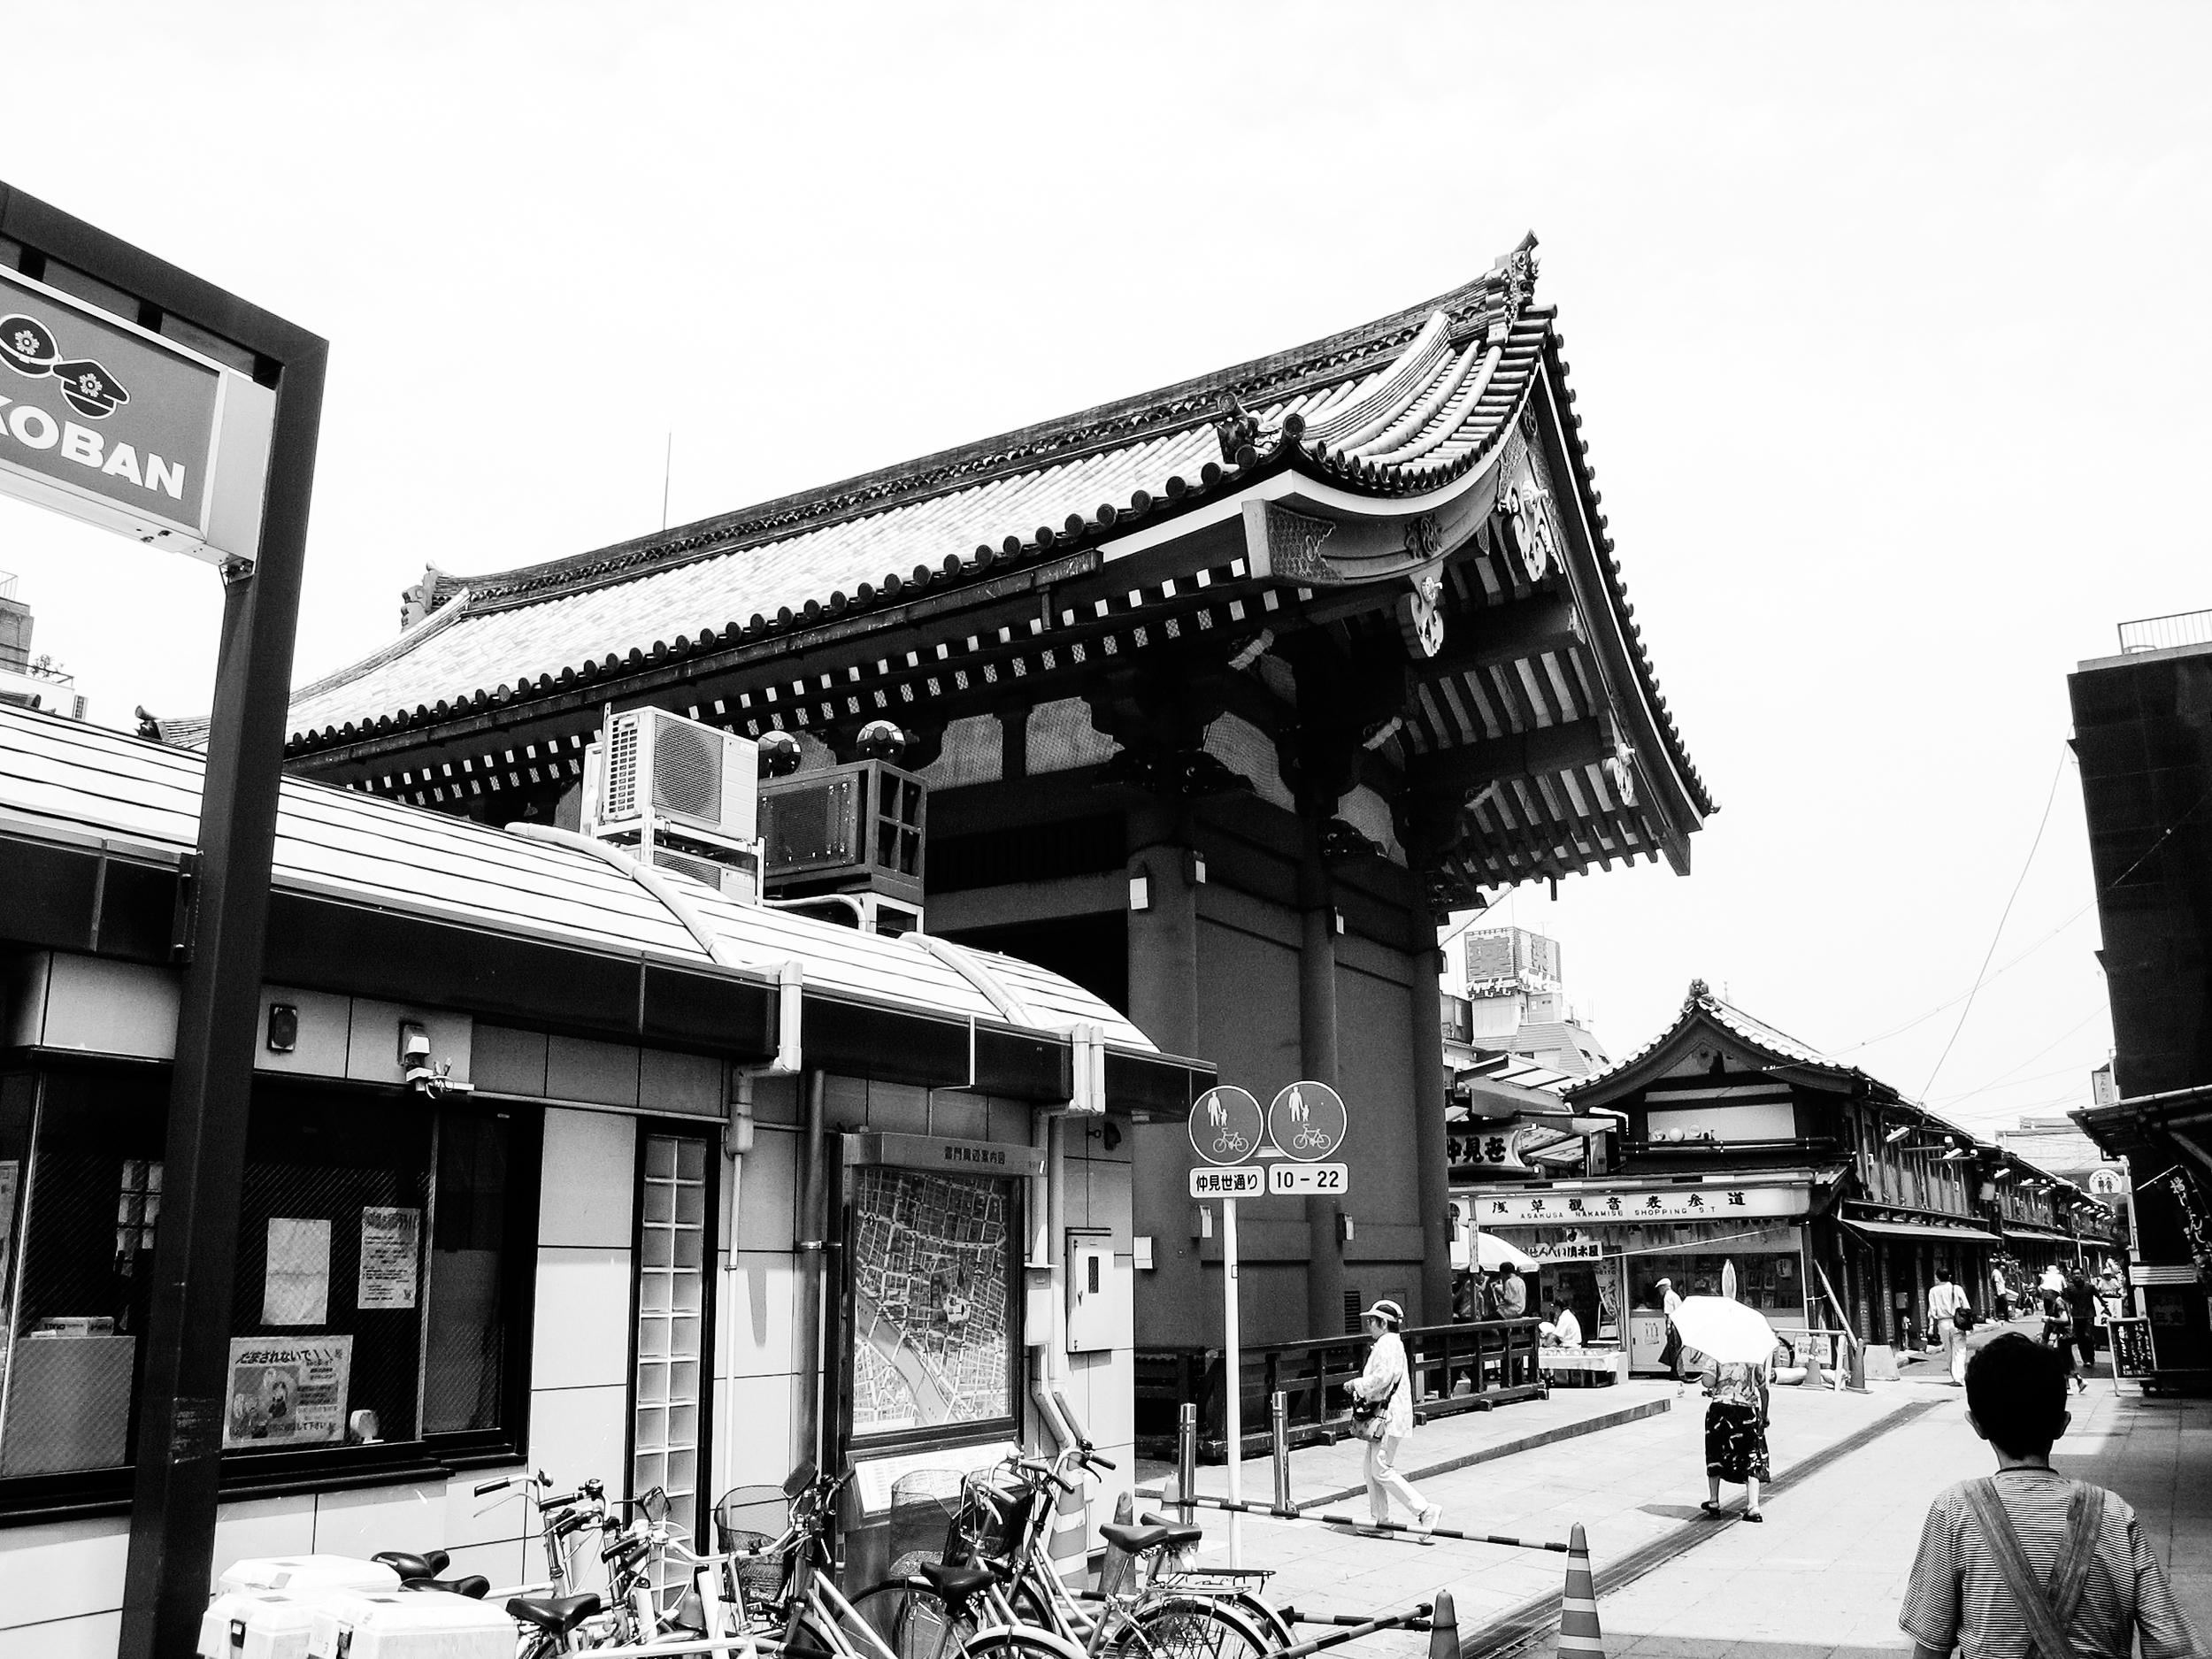 Entrance of the popular buddhist temple Sensō-ji in Asakusa, Tokyo.